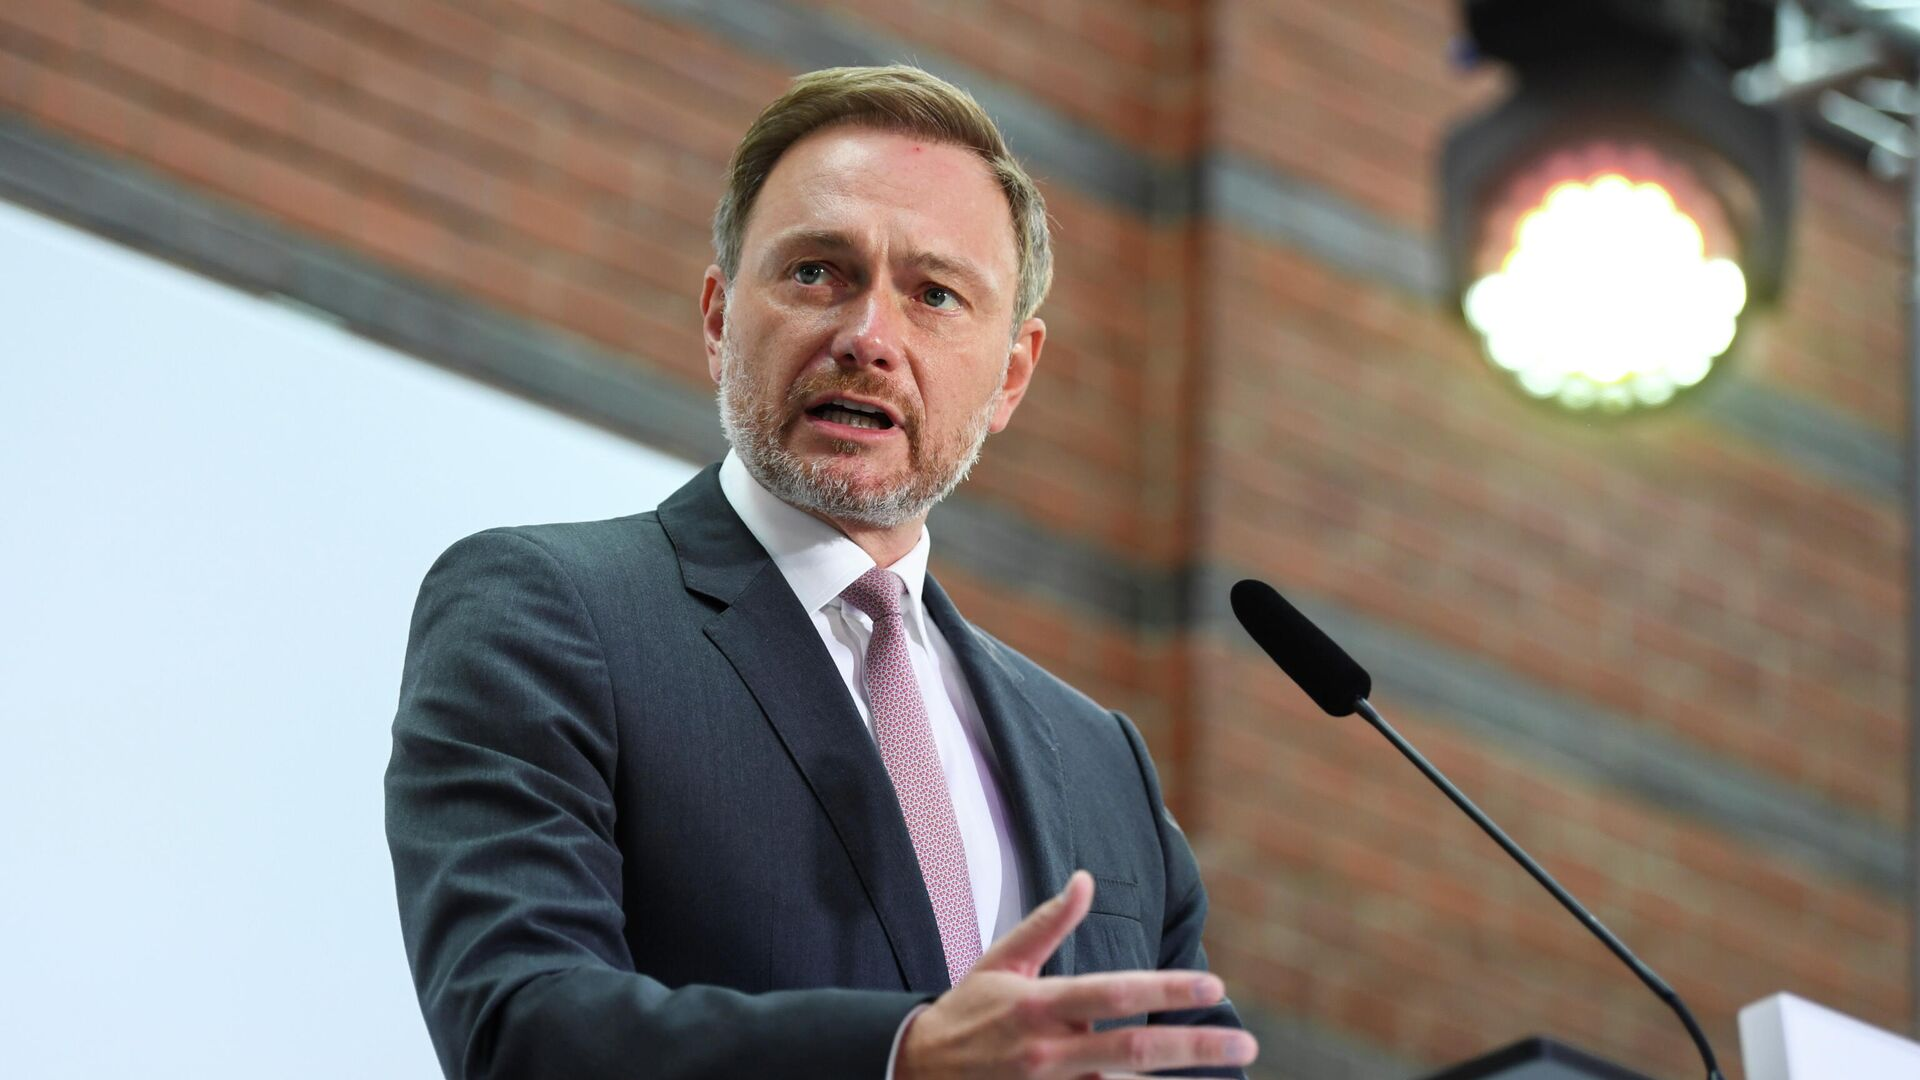 FDP-Kanzlerkandidat Christian Lindner am 27. September 2021 - SNA, 1920, 27.09.2021